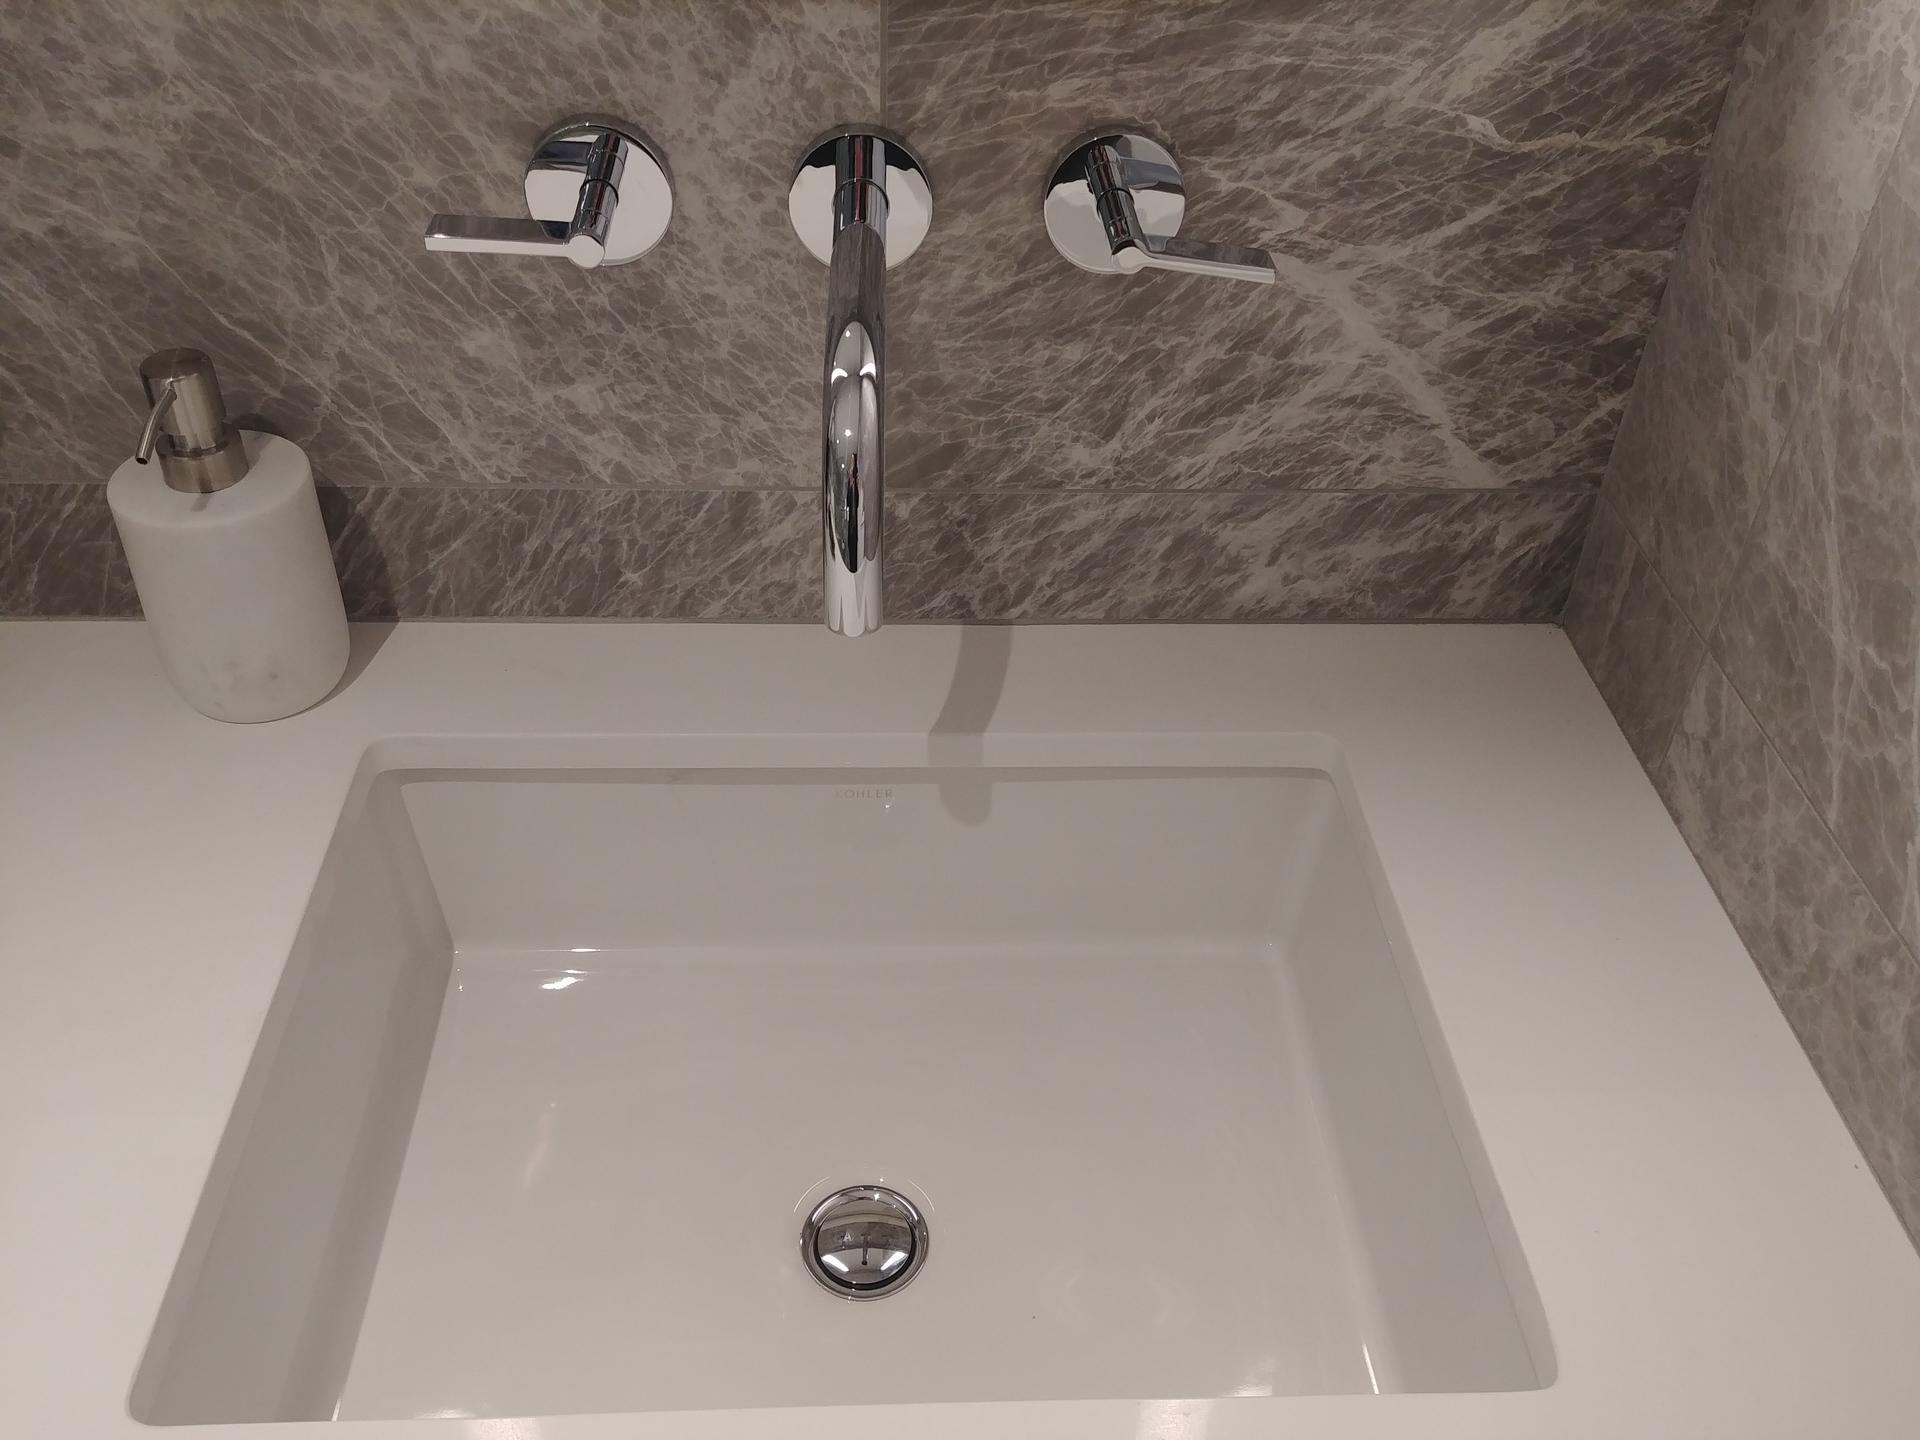 davie-nicola-bathroom-sinkdavie-scheme at Davie and Nicola (1188 Nicola, West End VW, Vancouver West)